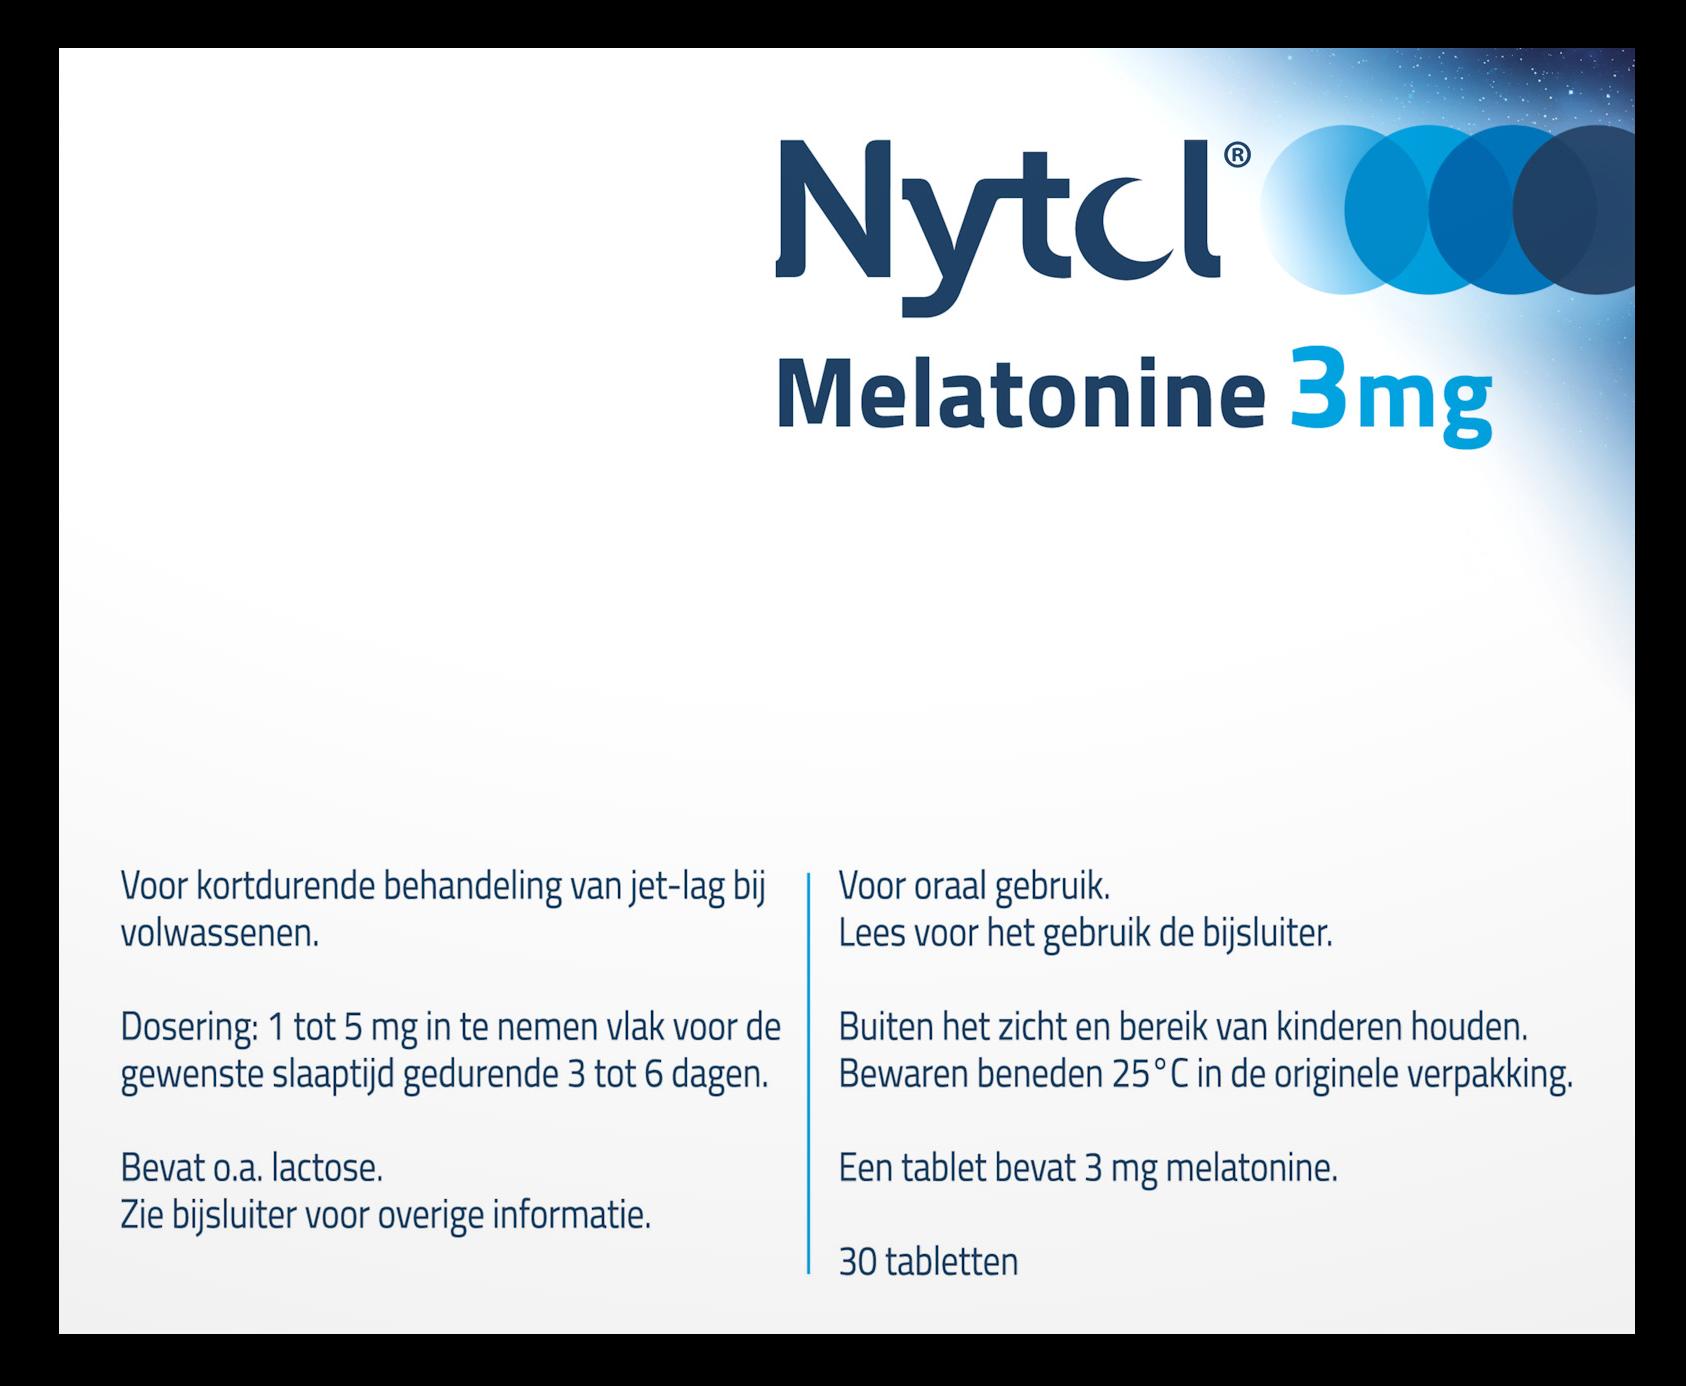 Nytol Melatonine 3mg